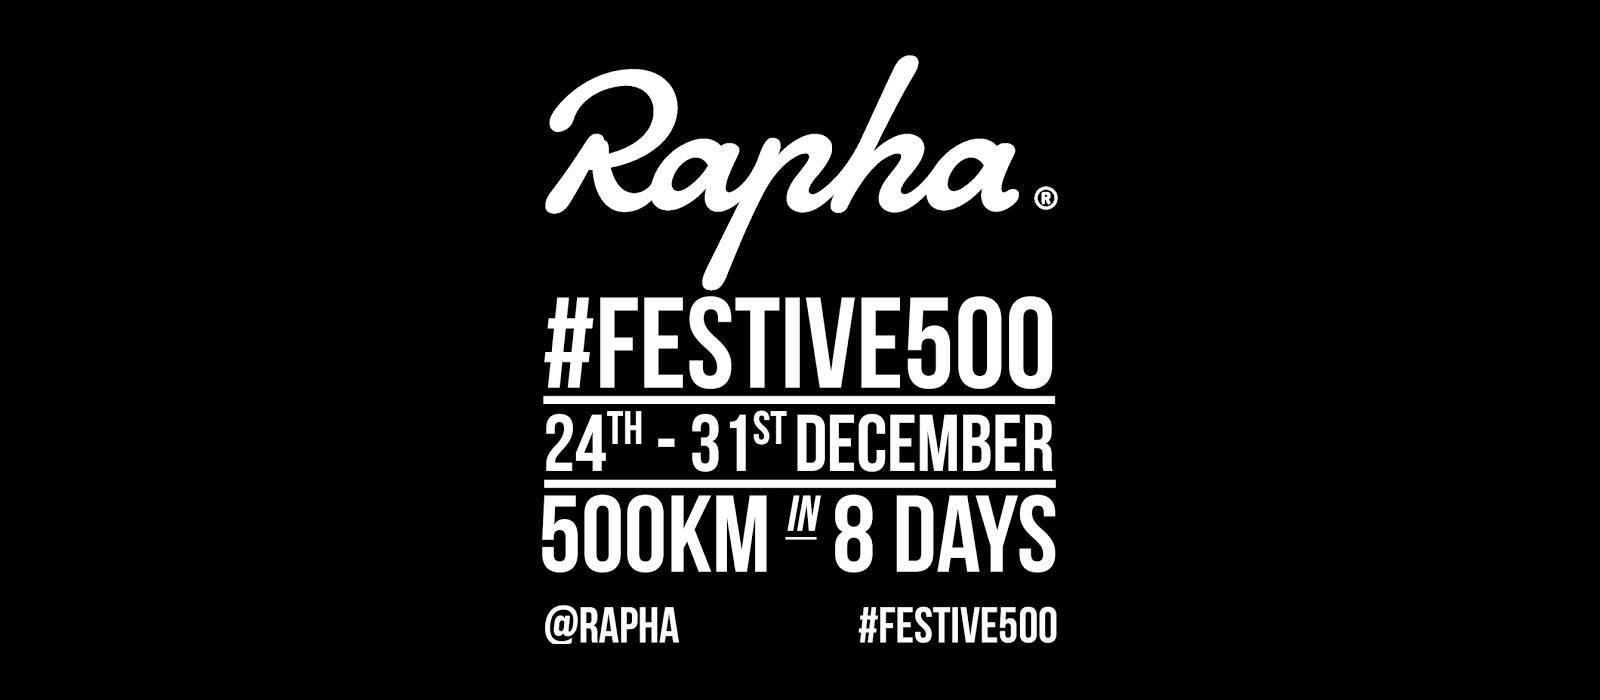 Rapha festive500 Banner